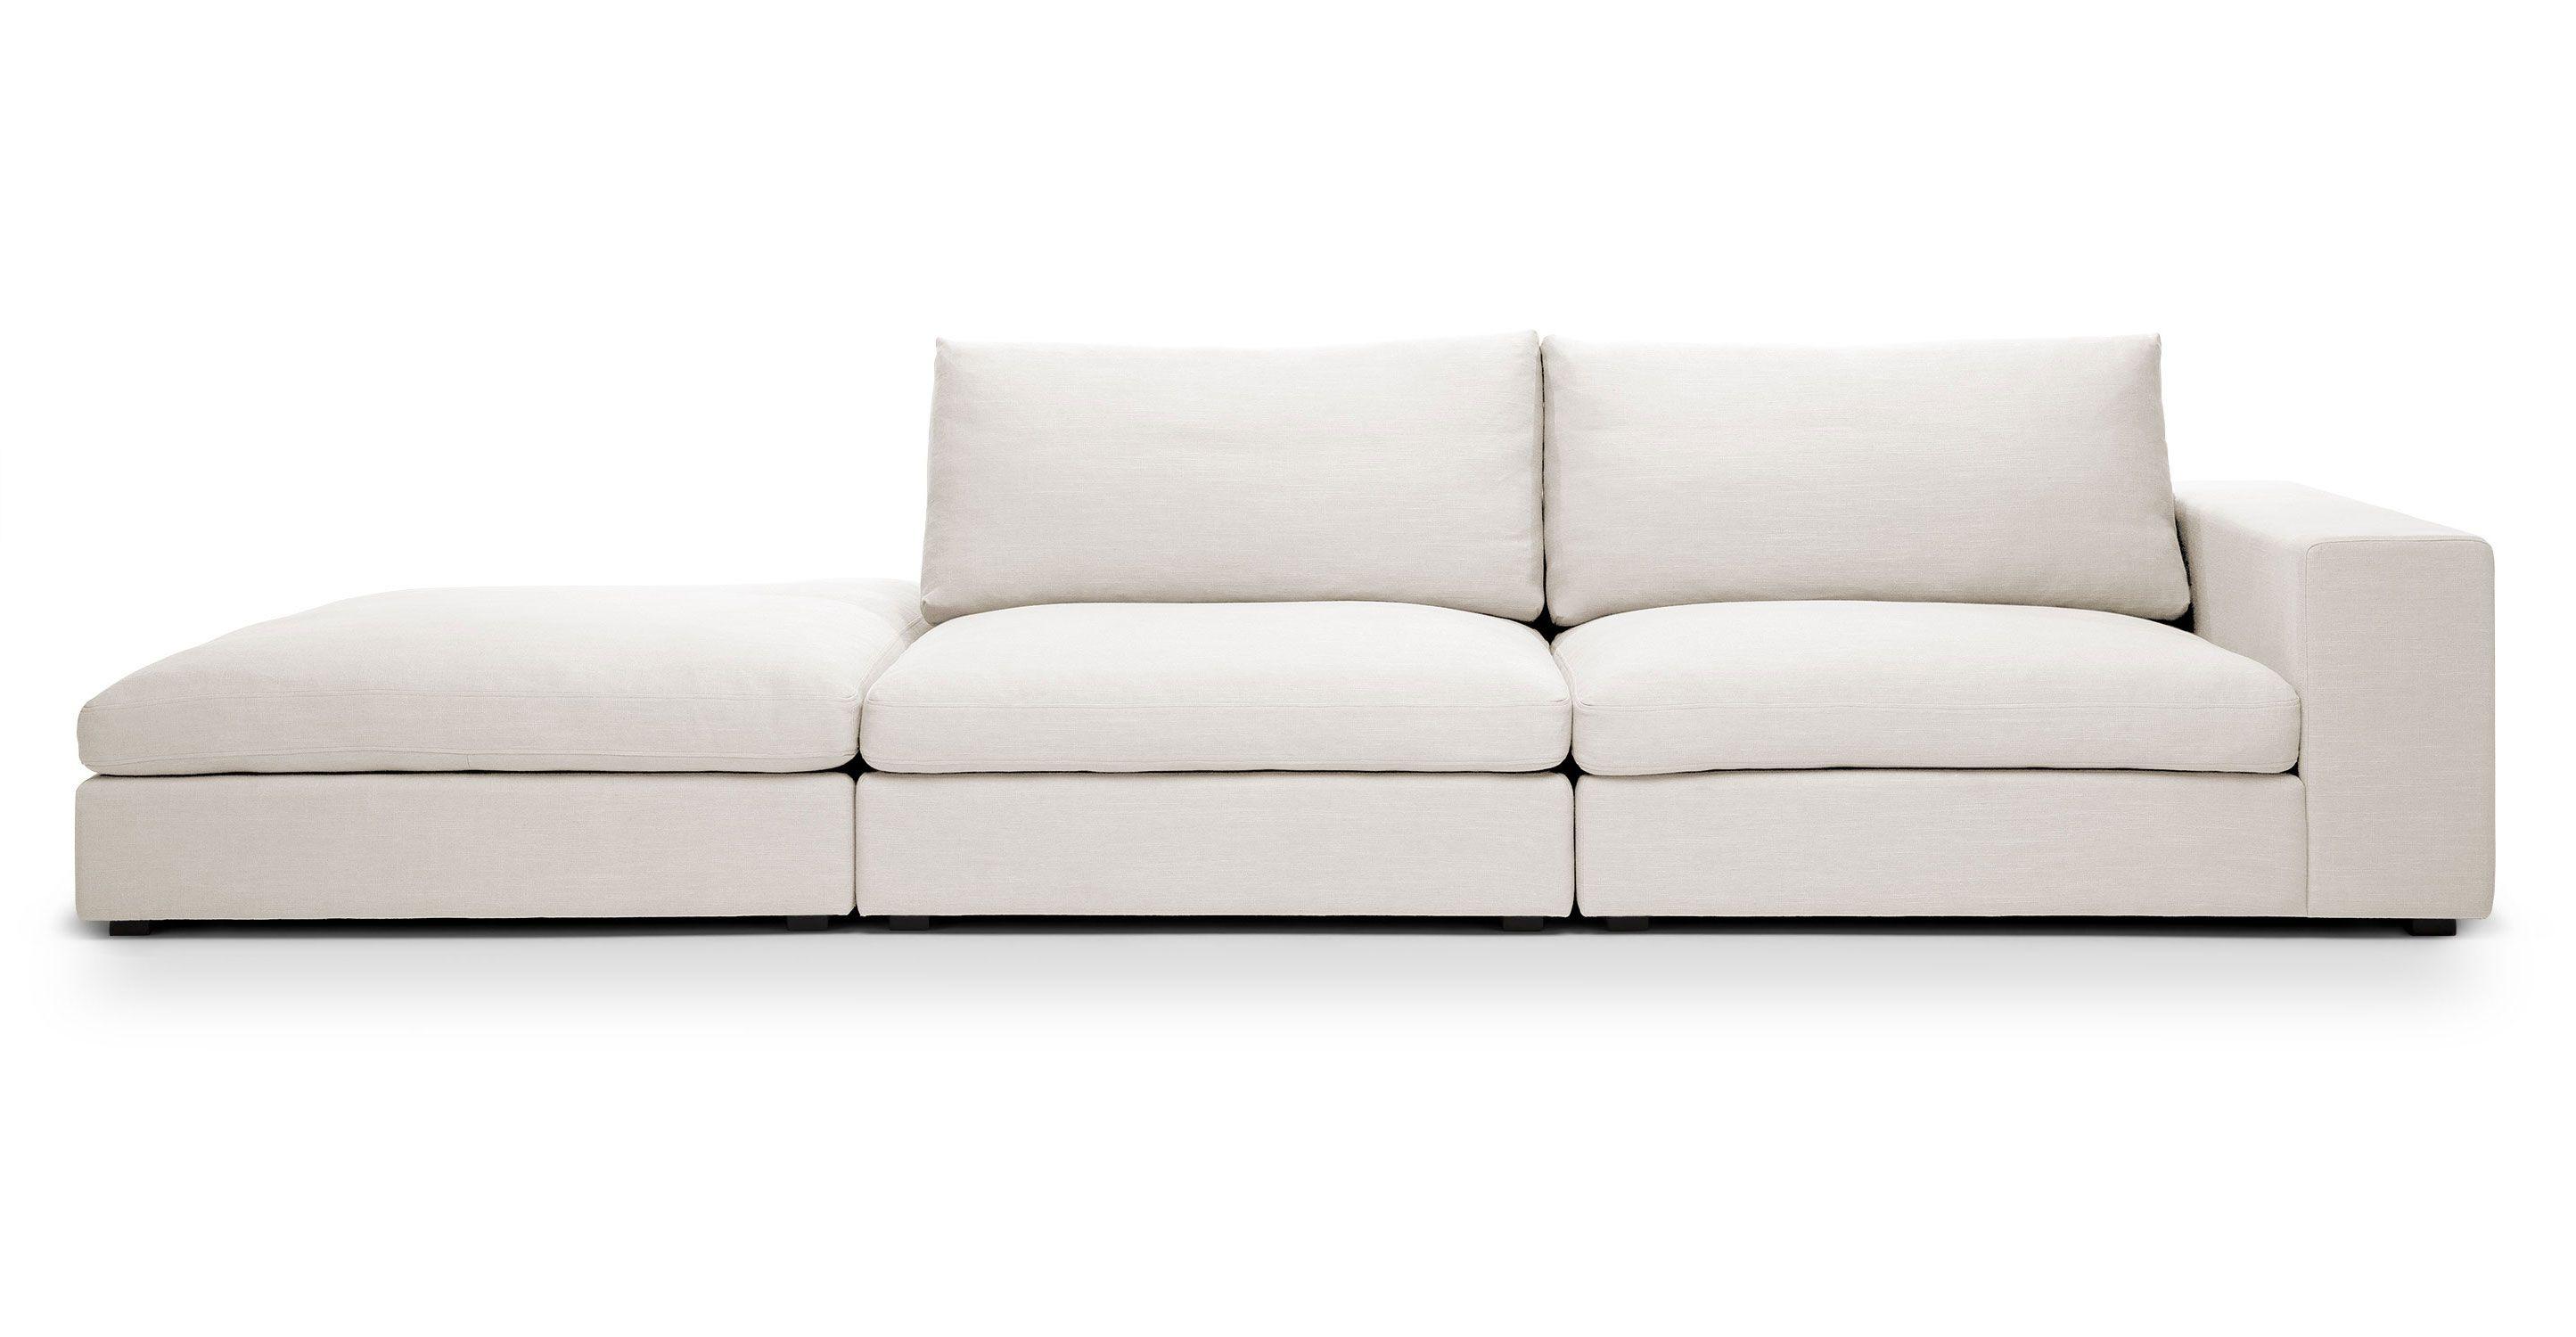 Cube Quartz White Modular Sofa Right Arm Modular Sofa Mid